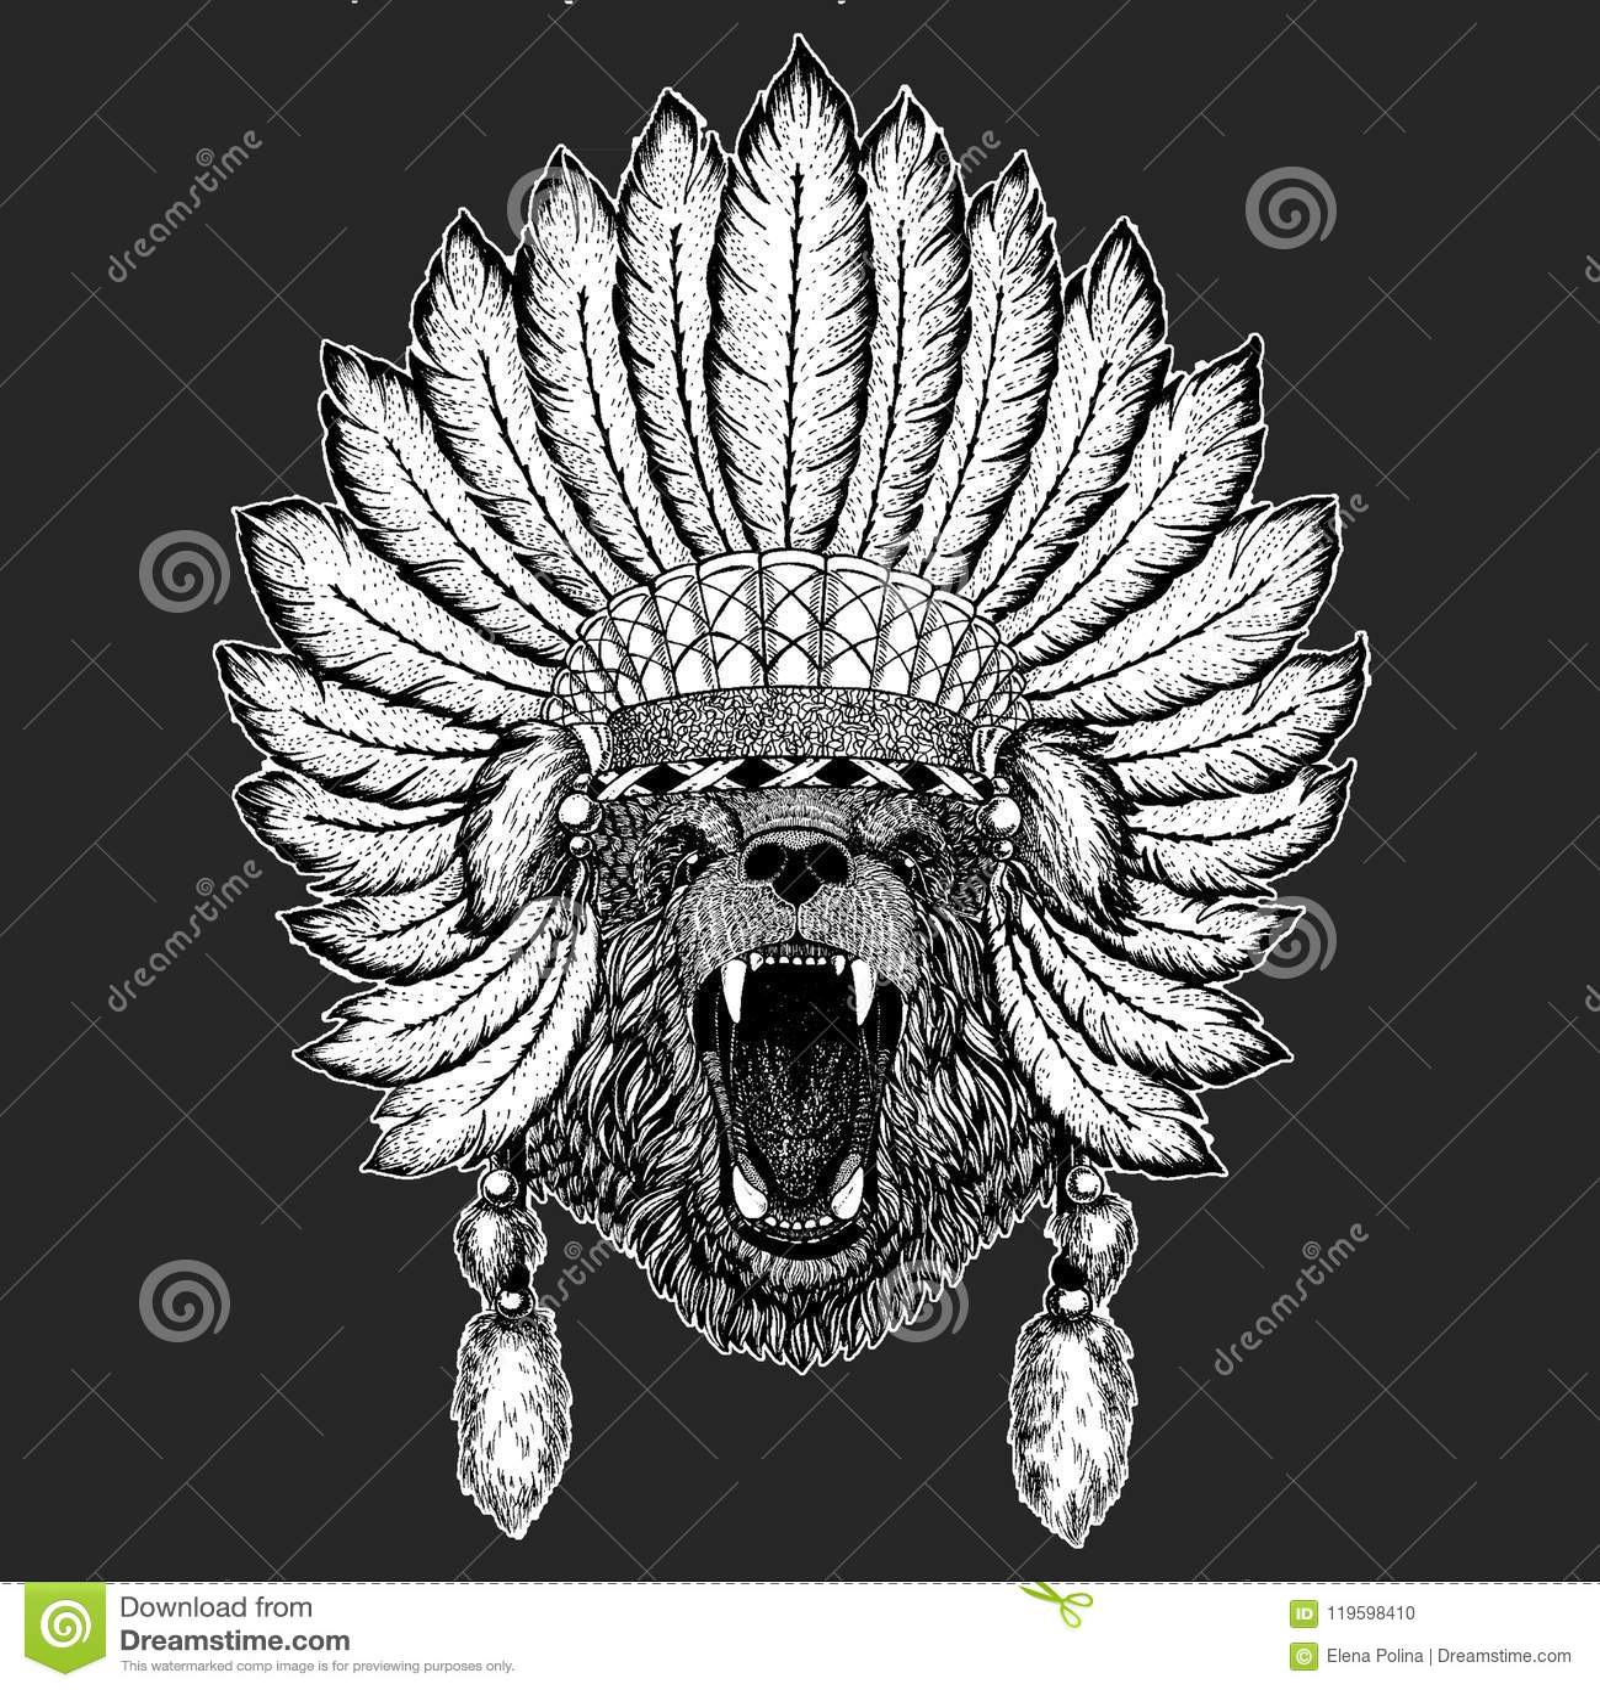 eb4862b7b6f0b Bear Hand drawn picture for tattoo, t-shirt, emblem, badge, logo patch